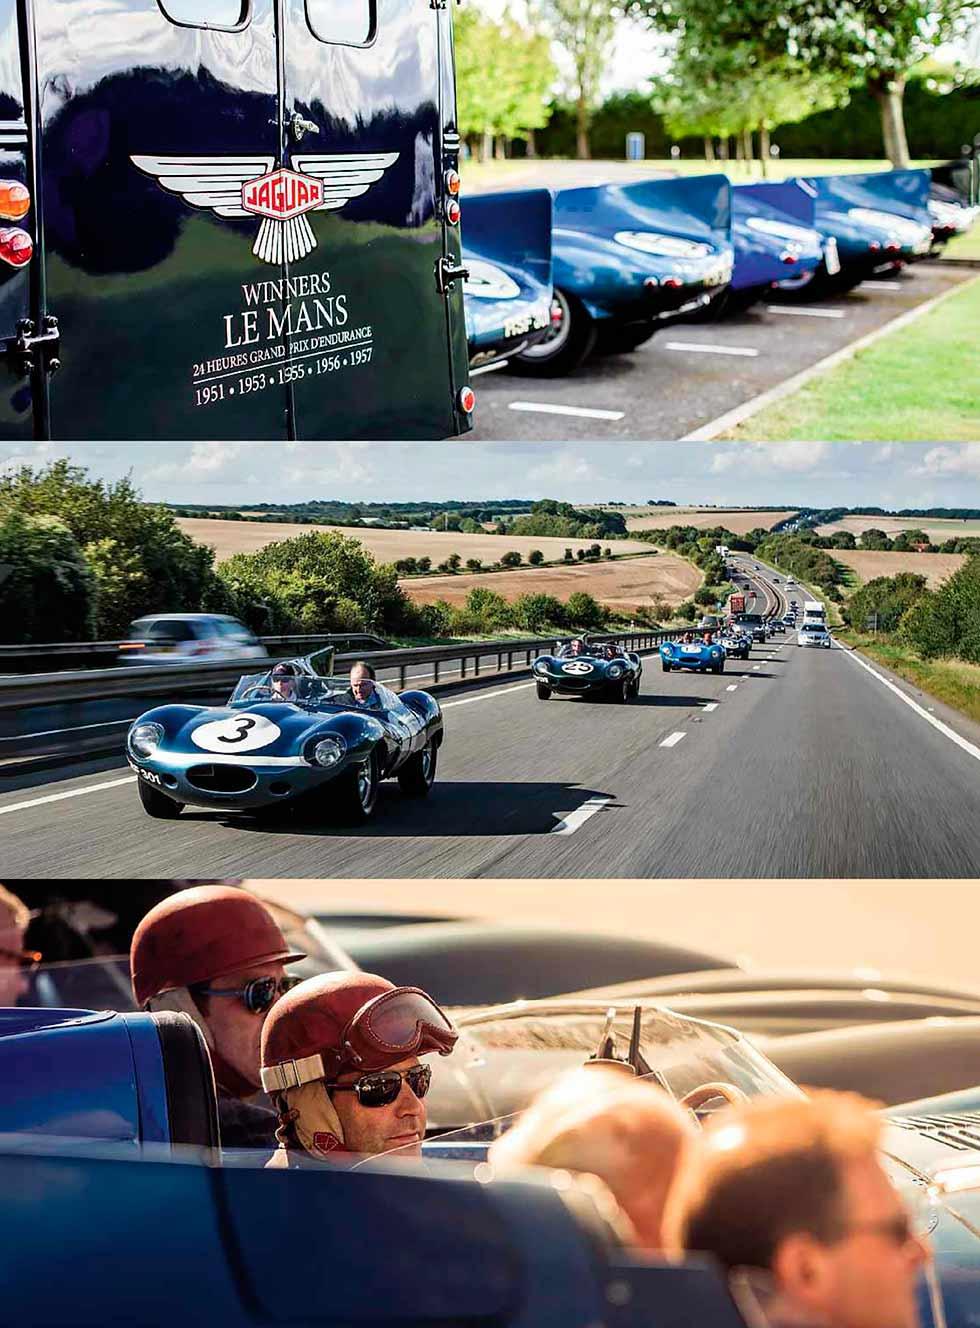 Le Mans 1957 Jaguar D-Types road and track test